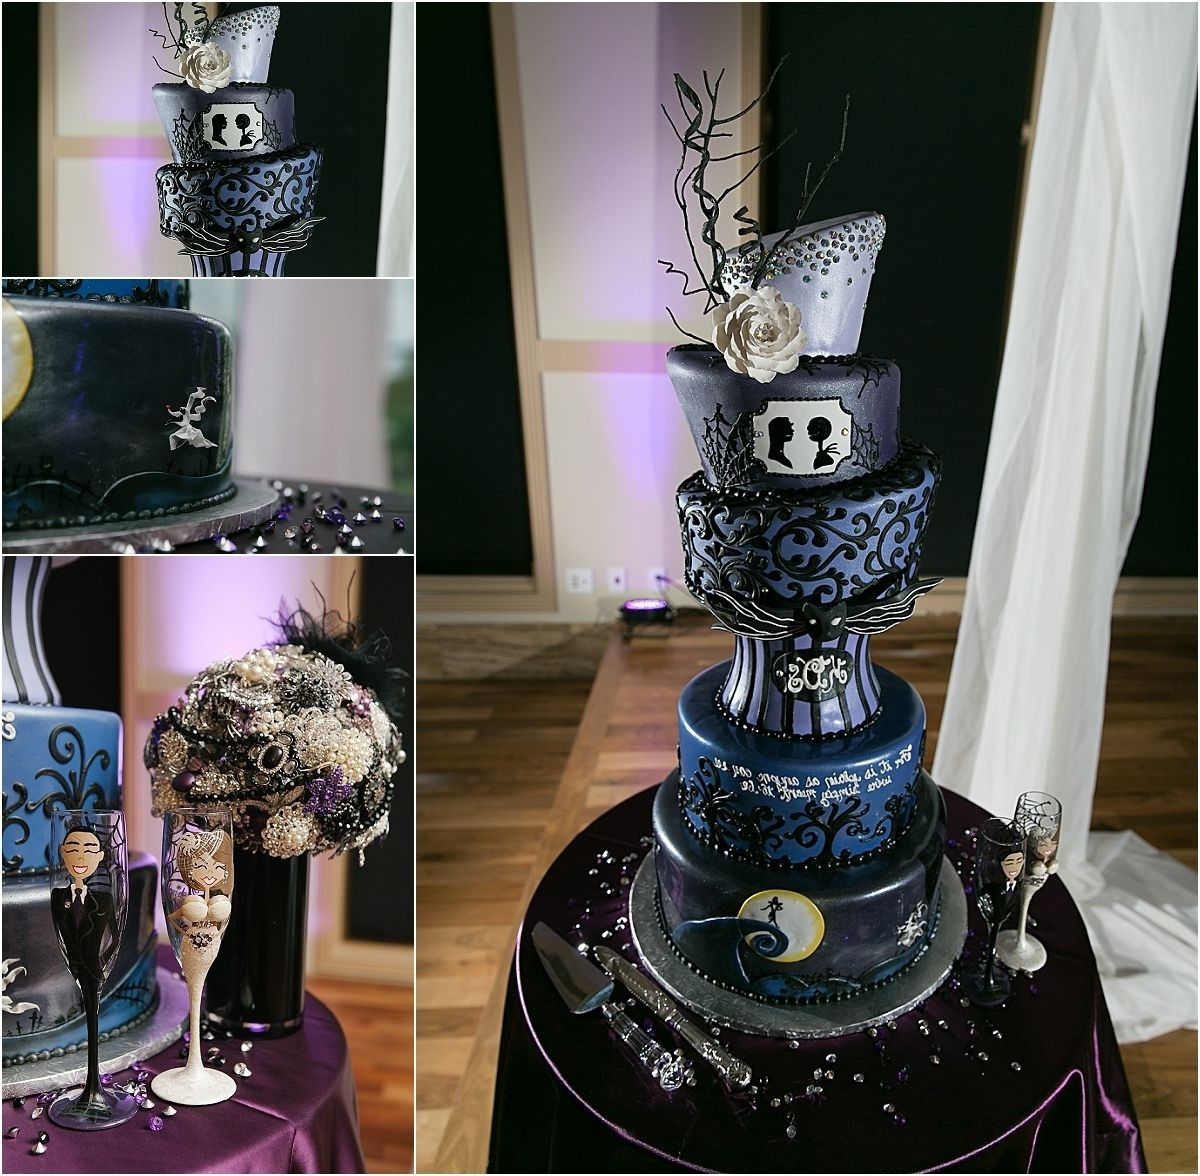 Tim Burton Themed Wedding Cakes Nightmare Before Christmas Wedding Christmas Wedding Cakes Christmas Wedding Themes